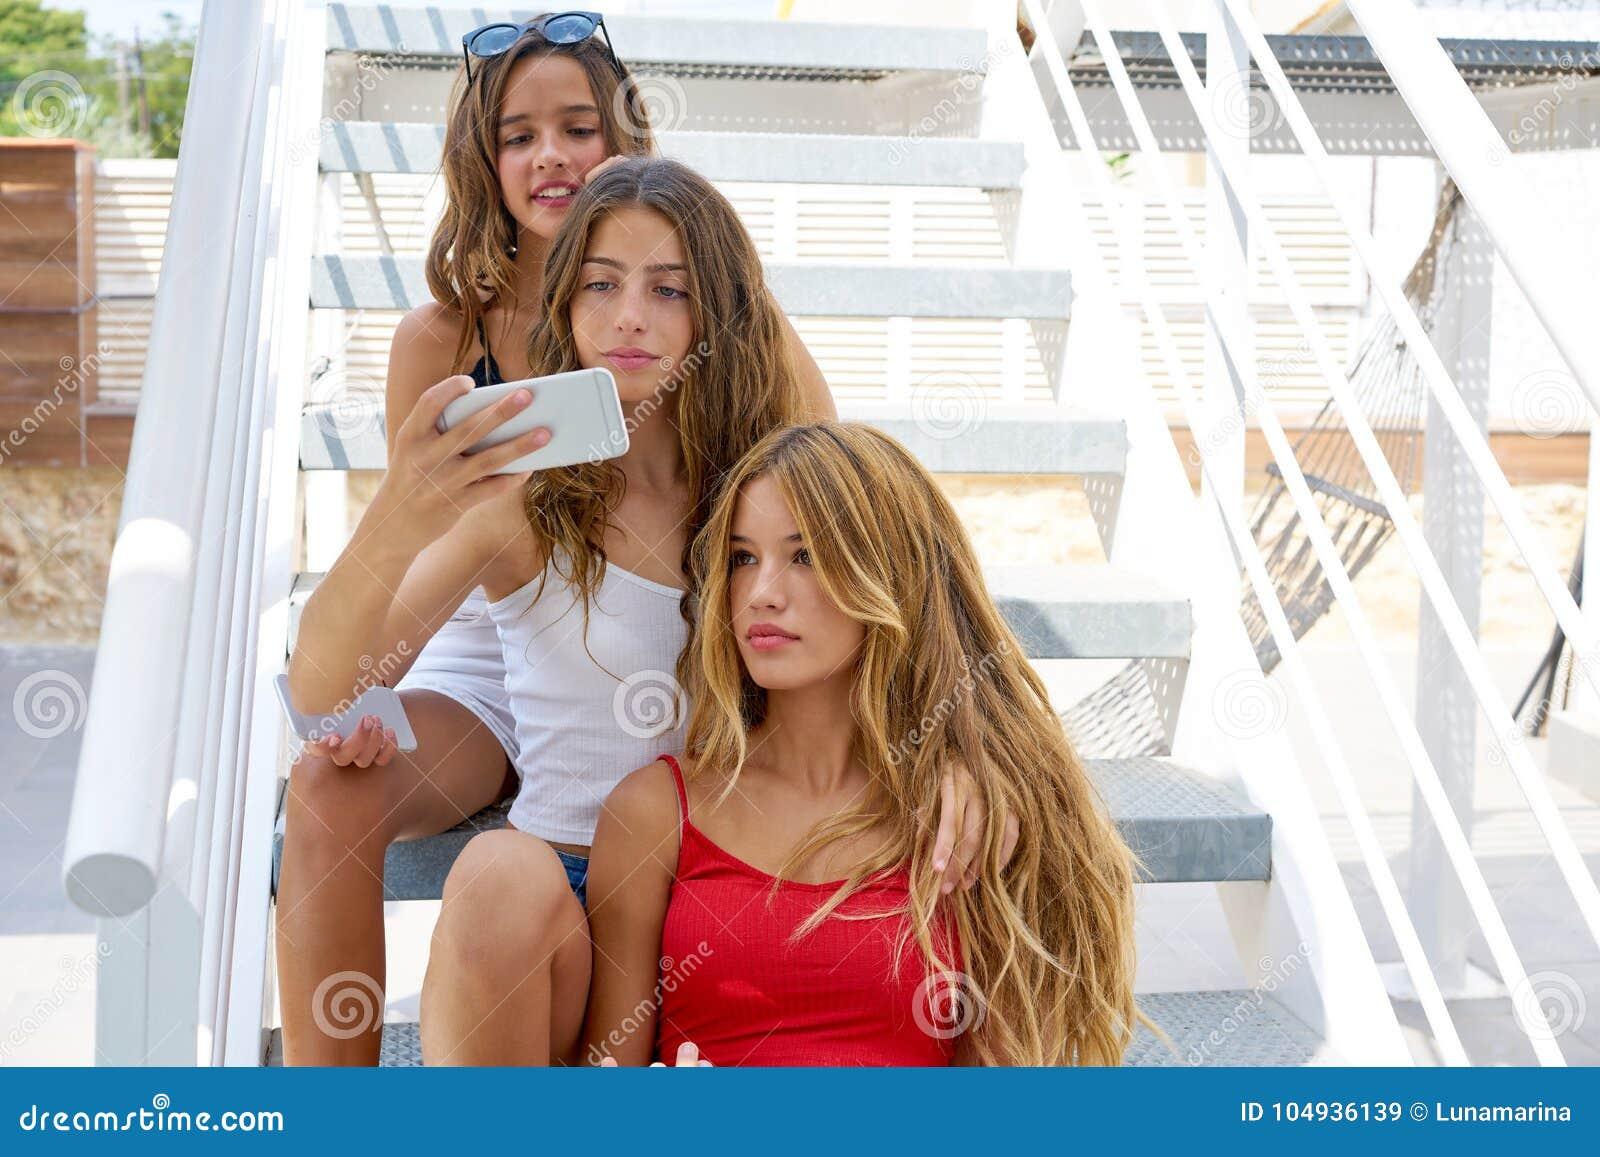 Yung xxx teen school girls